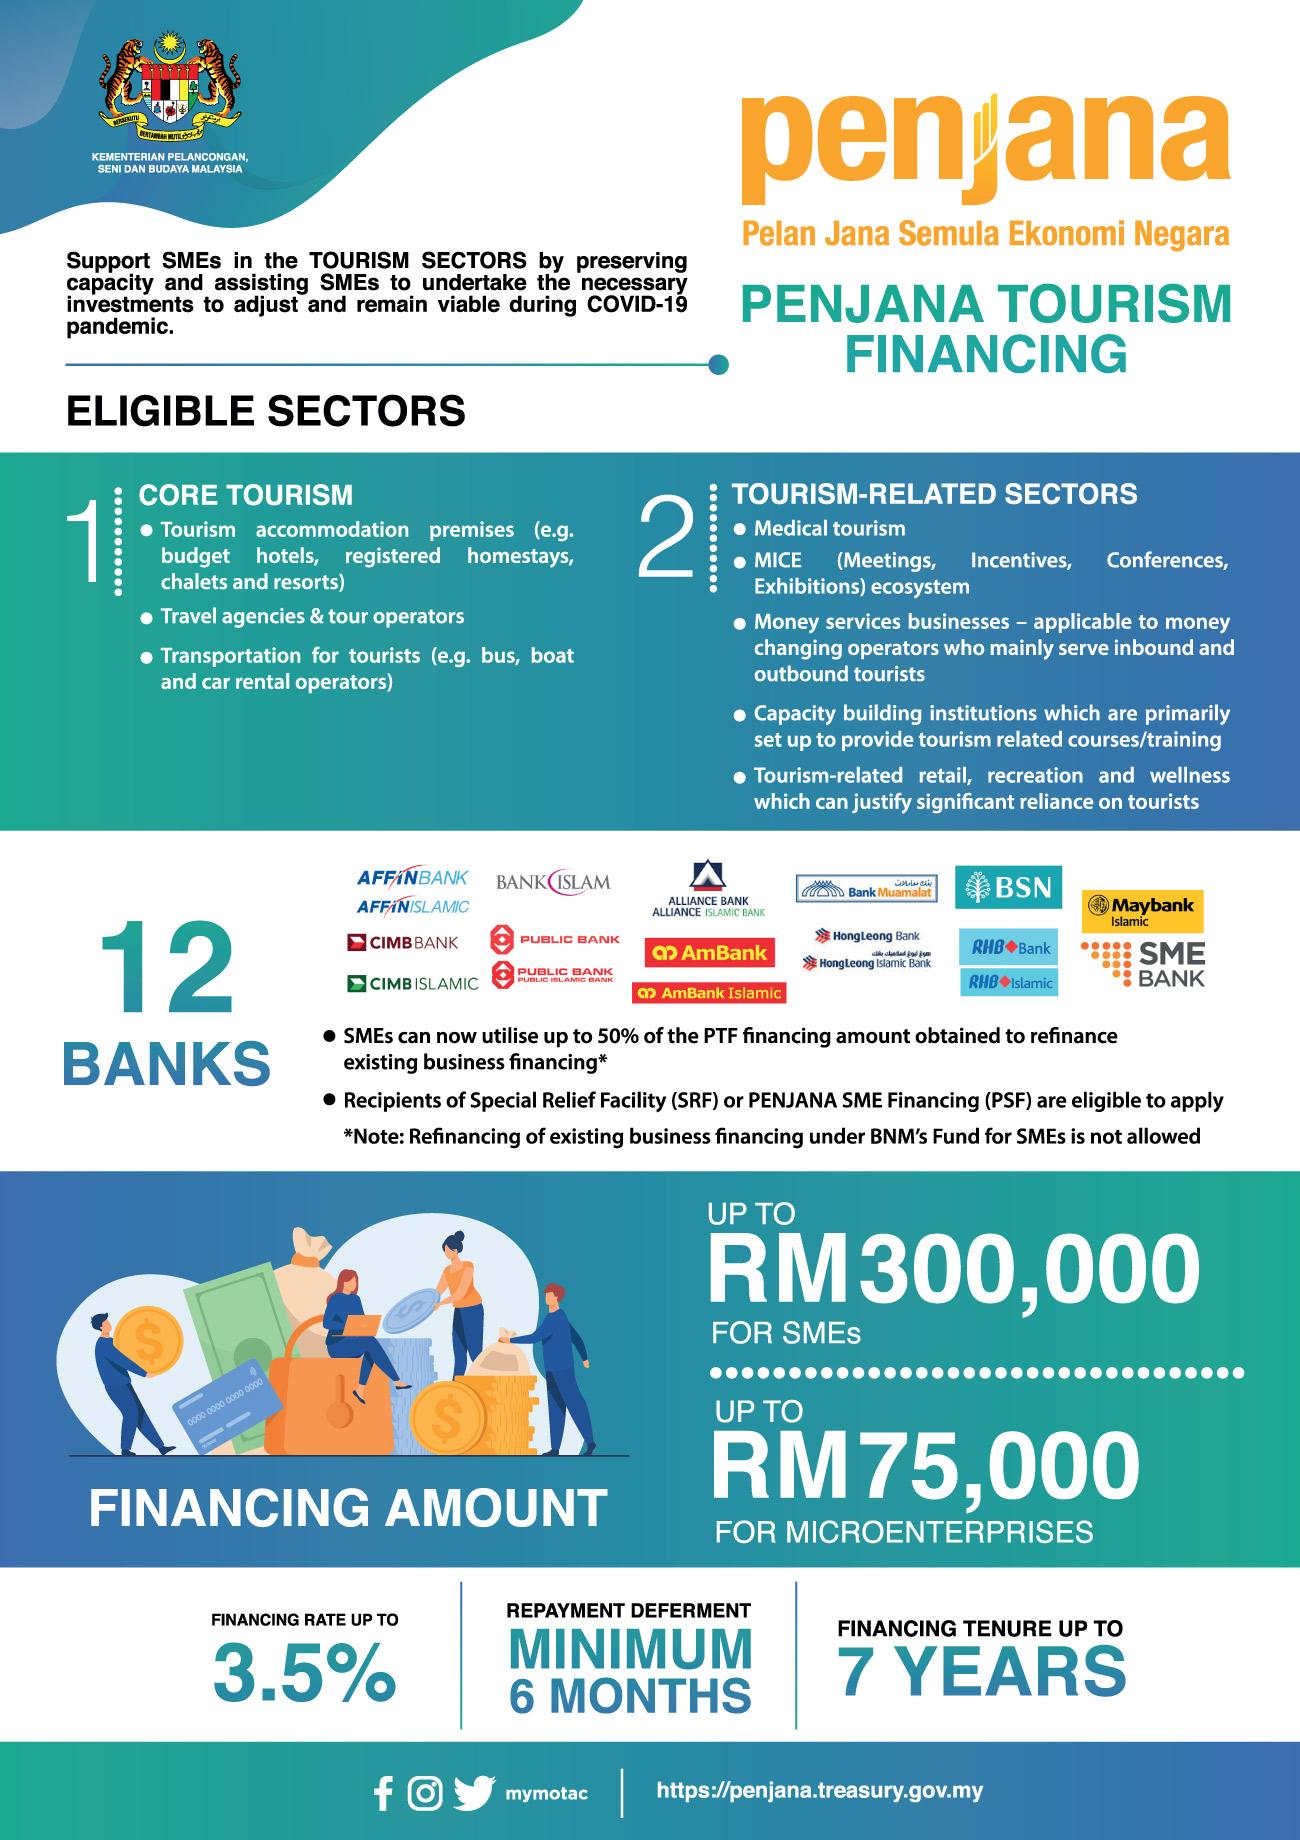 PENJANA Tourism Financing (TFT)